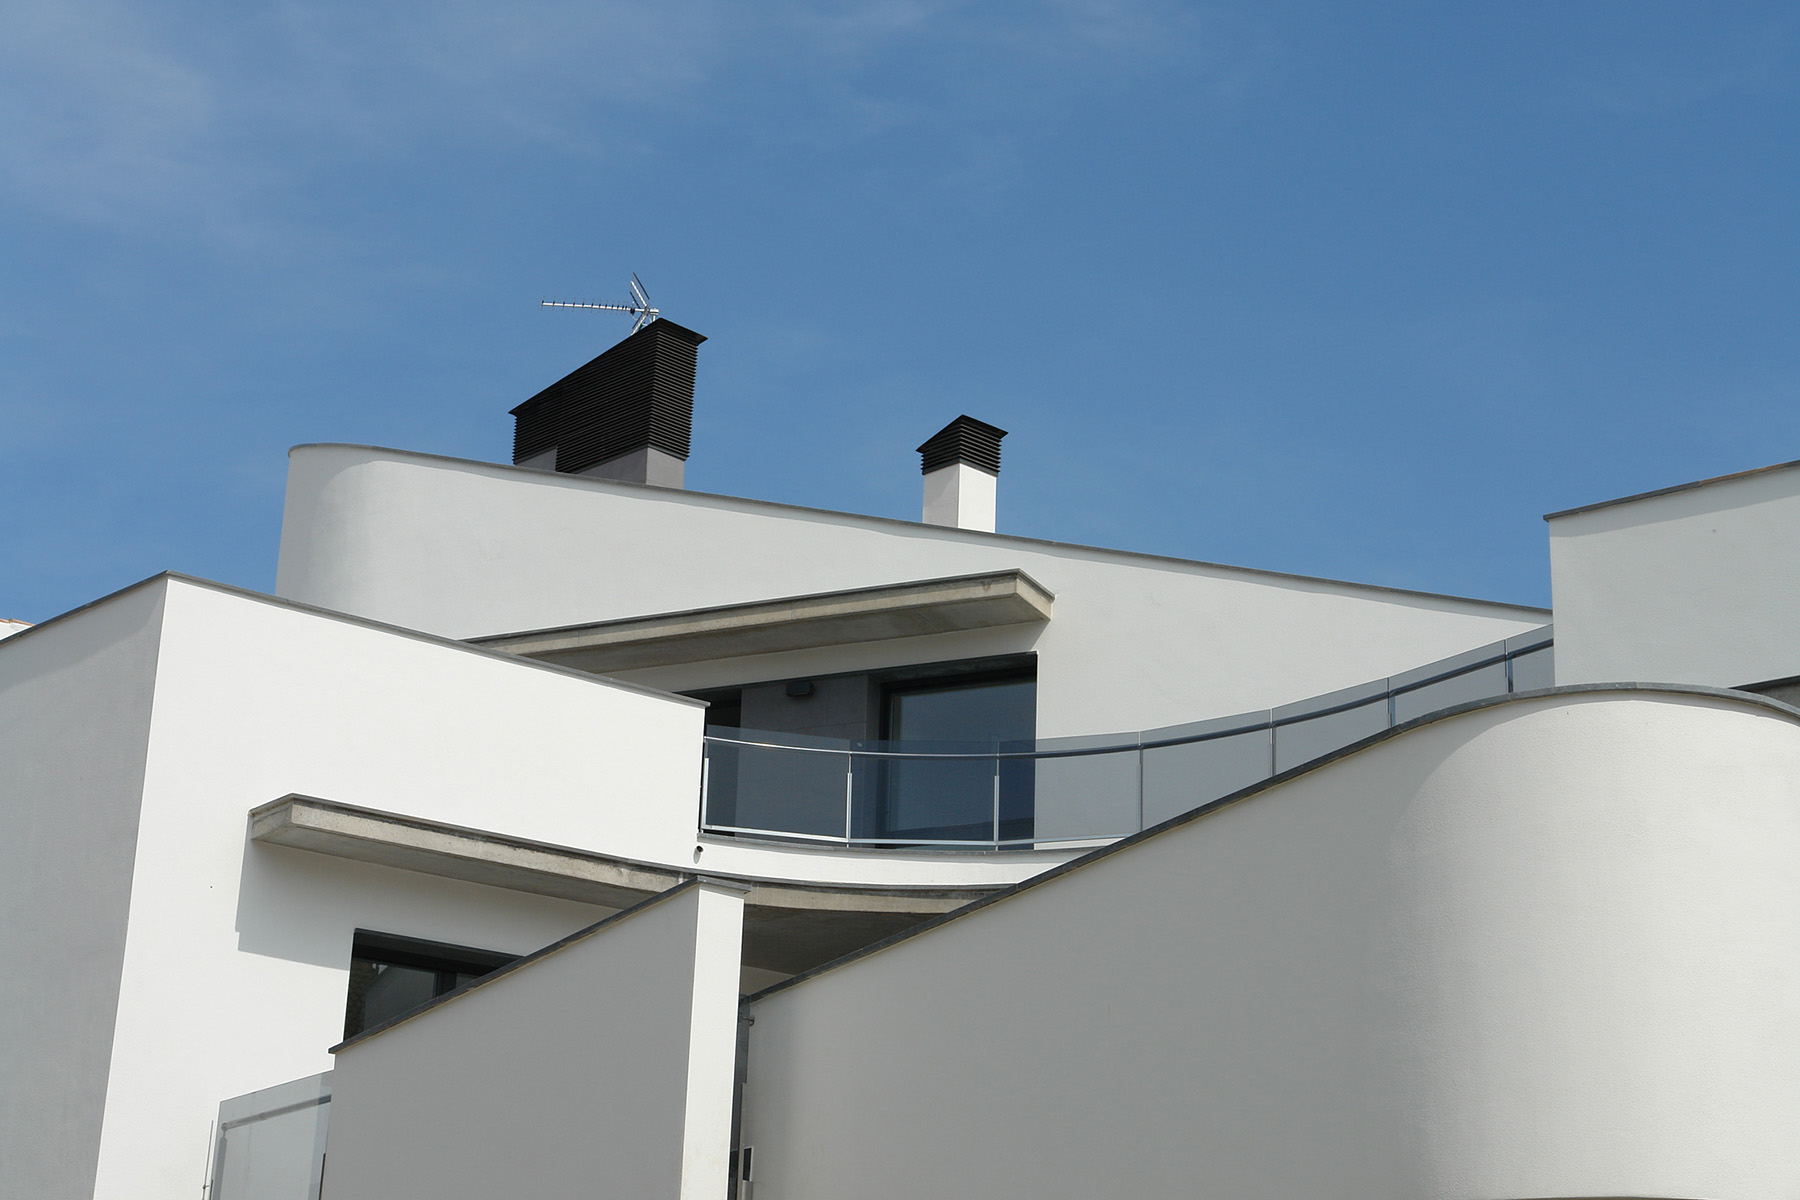 Galeria Casa en Binéfar, Huesca - 6 ?>